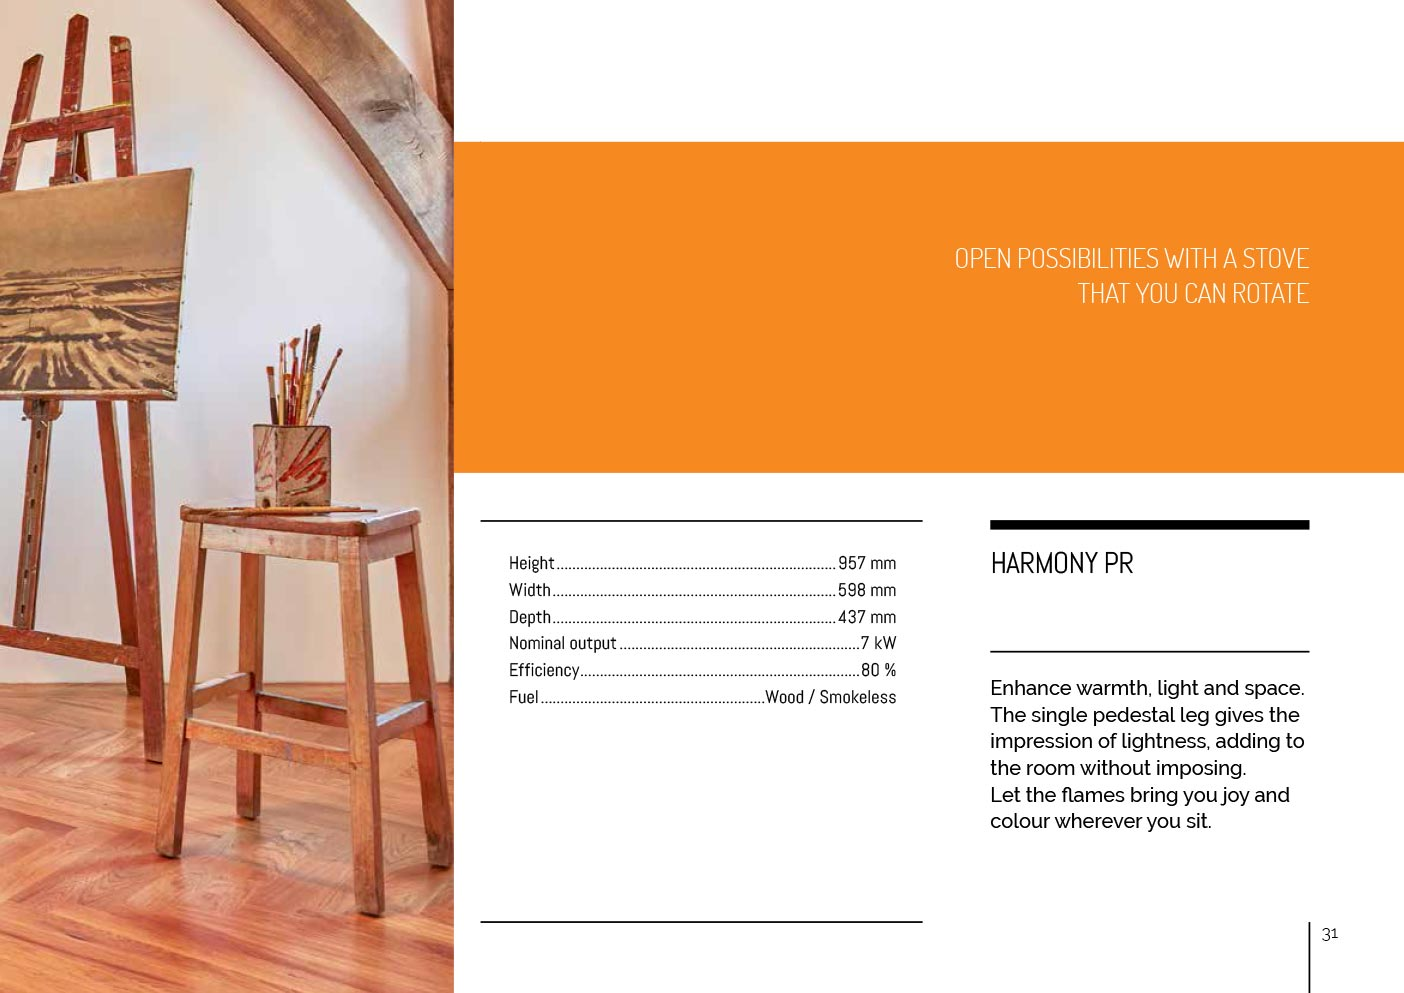 opus-stoves-brochure-(2)-31